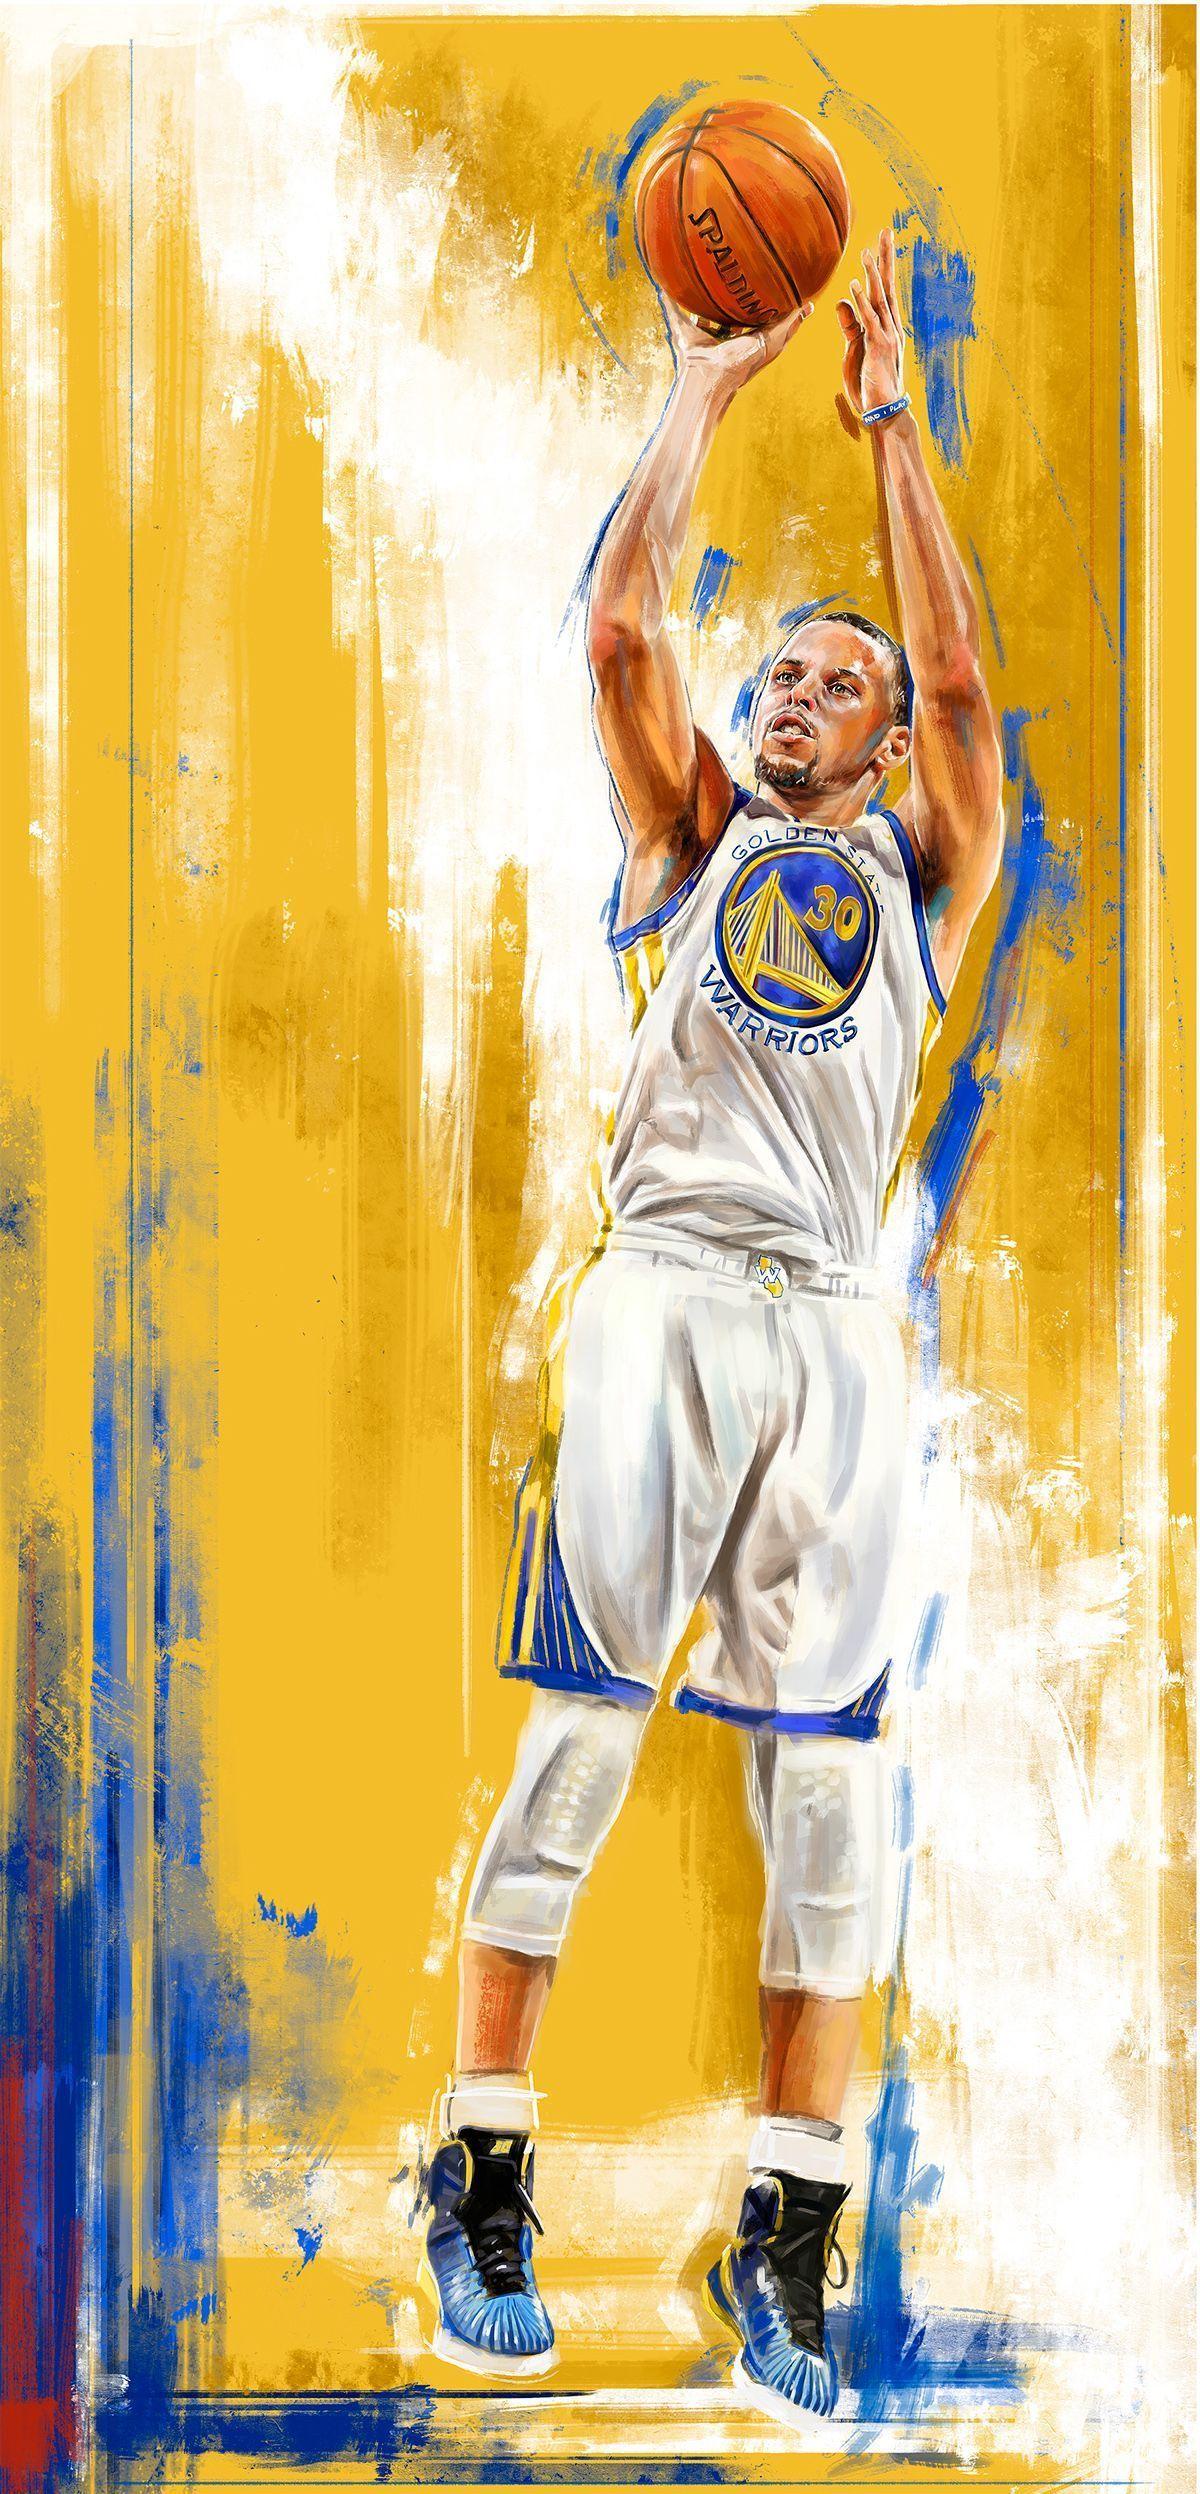 2015 Nba Playoff Player Illustrations Nba 2015 Nba Playoff Player Illustrations On Behance Nba Basketball Art Nba Stephen Curry Nba Pictures